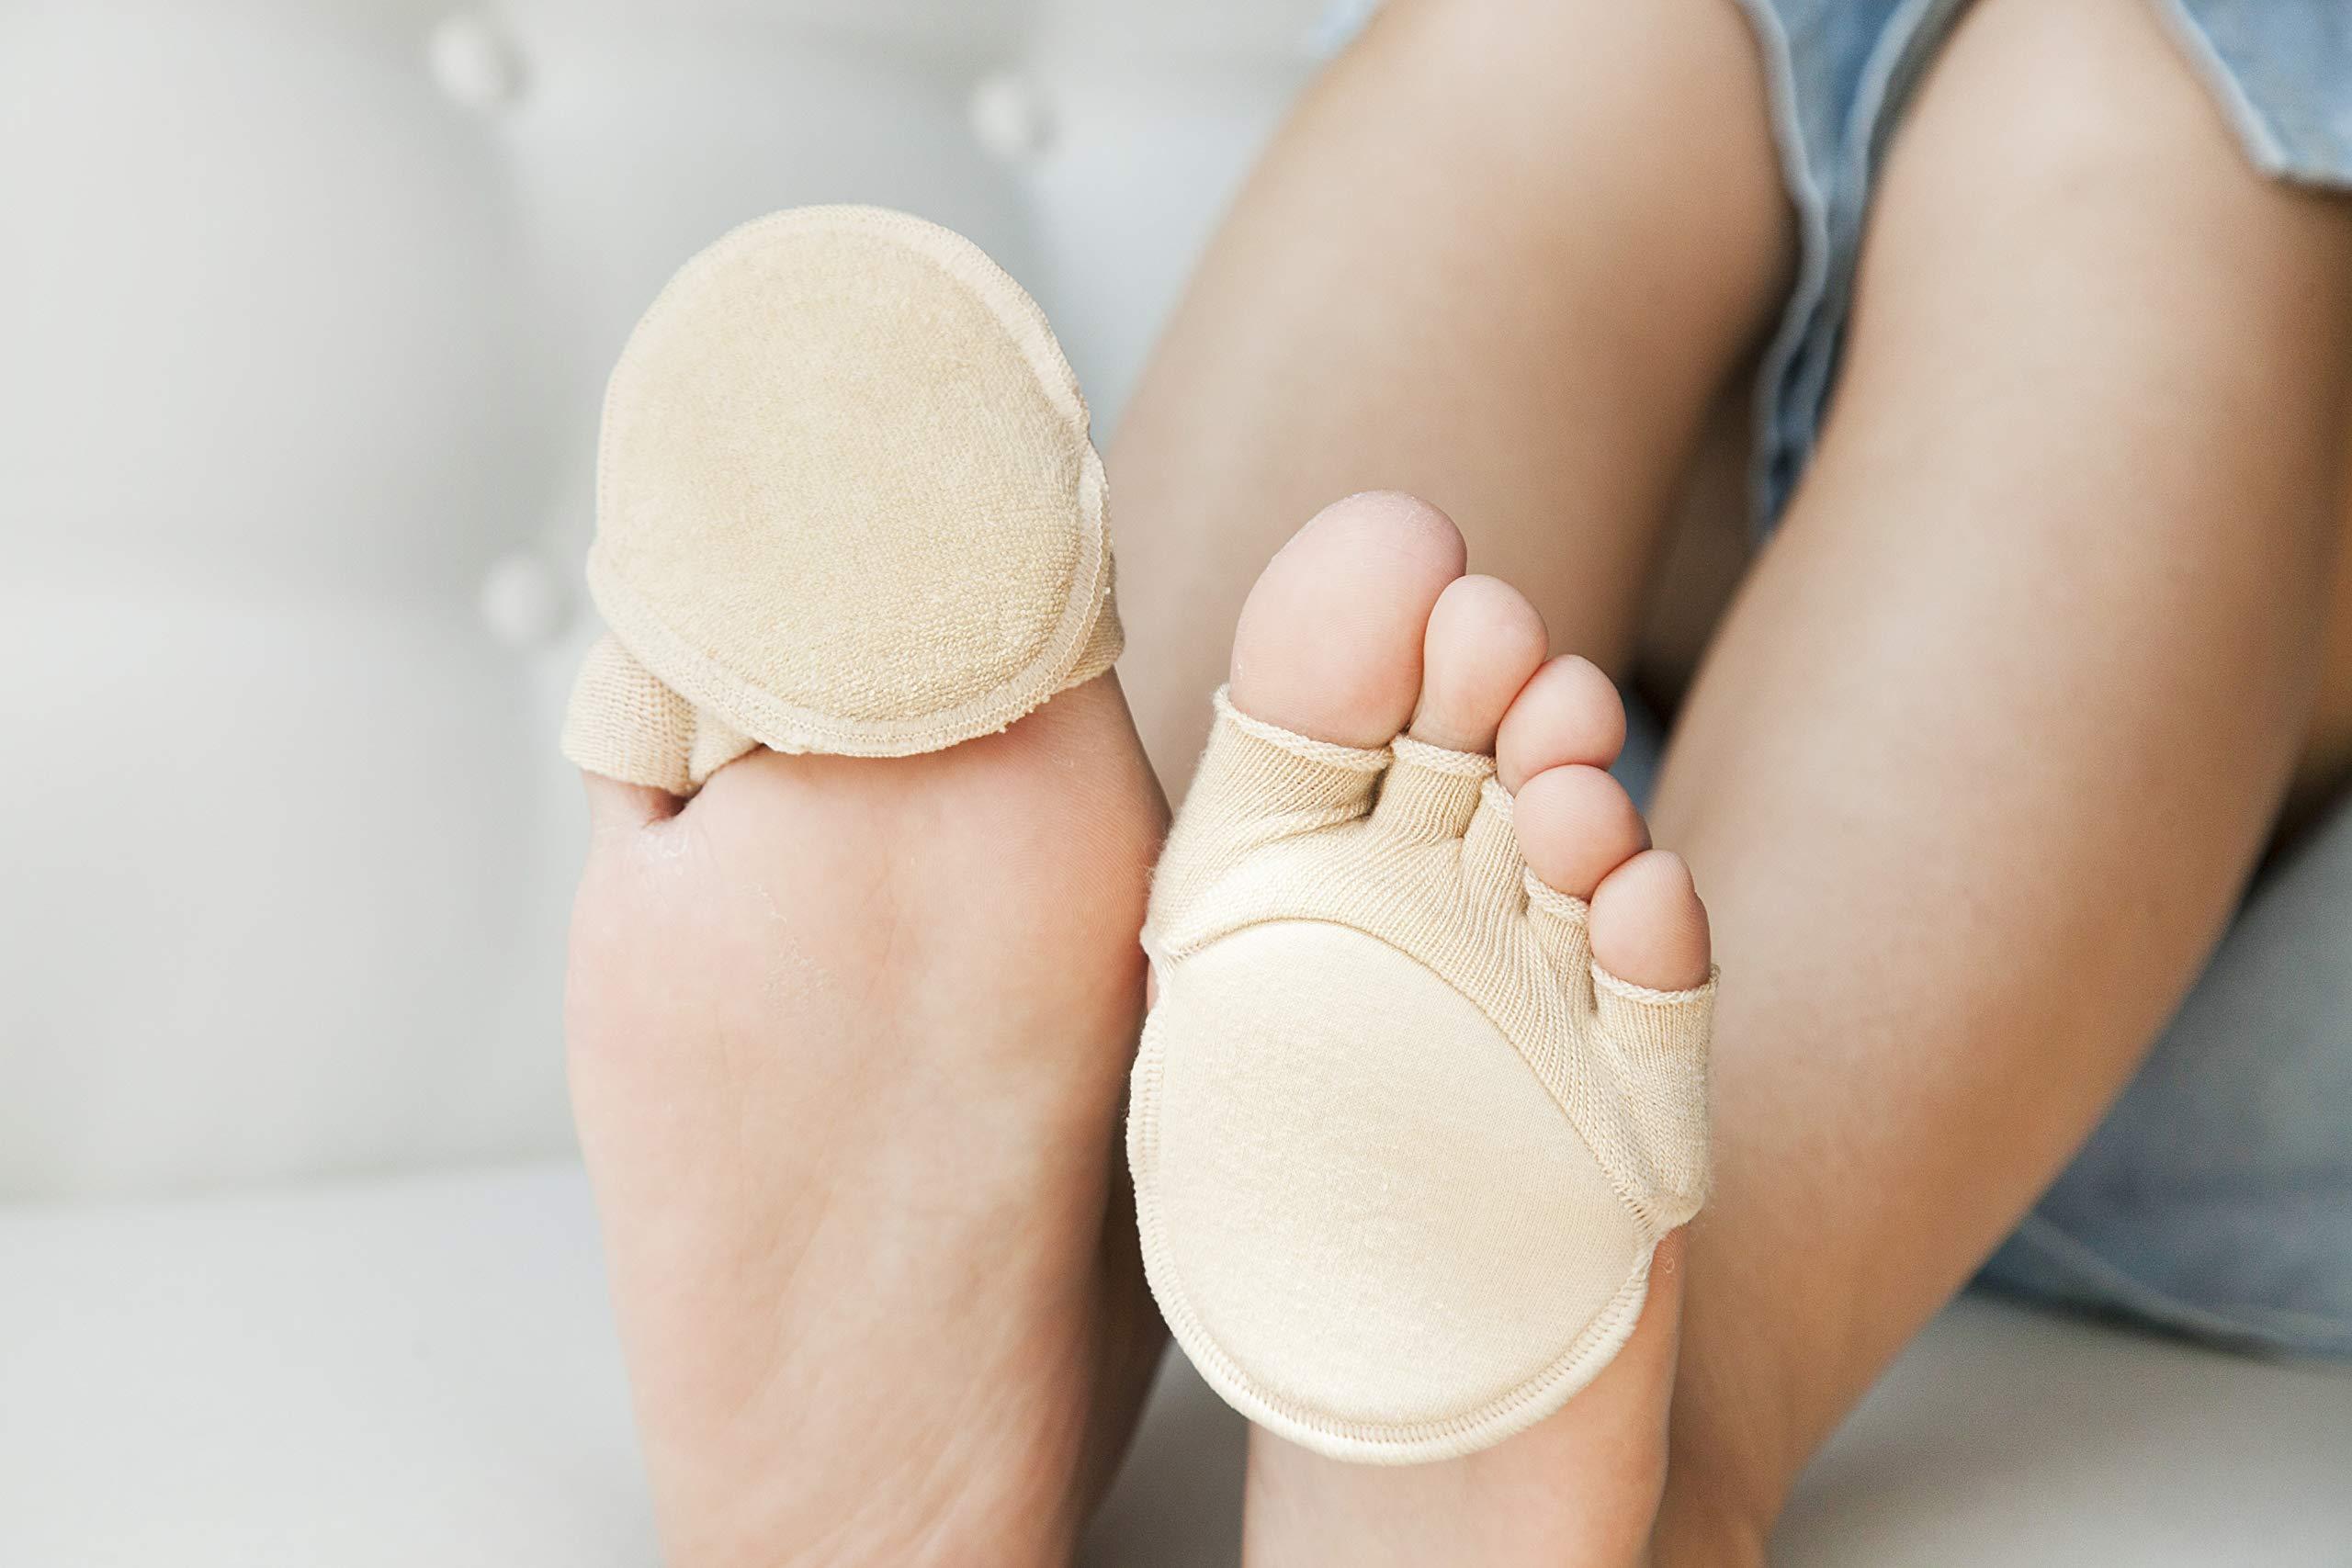 Toe Socks, Cotton Non-Slip Women's Toe Toppers Socks Toe Separating Socks No-Show Half Socks Barre Pilates Yoga Half Palm Socks(2 Pairs) by Pnrskter (Image #5)